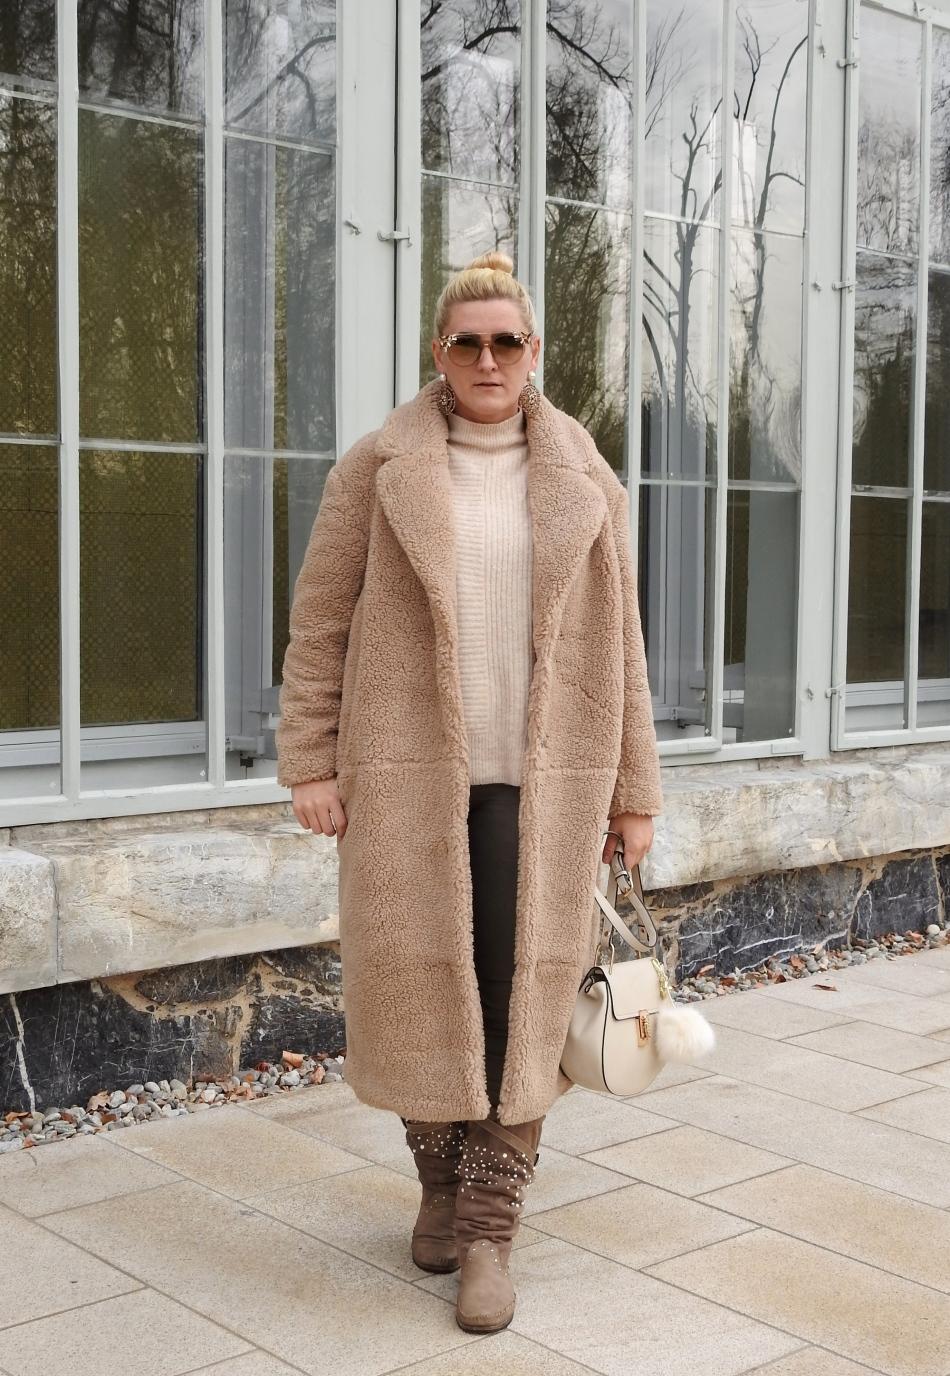 Teddy-Coat-Sunglasses-Shades-NoraNYC-Chloe-Drew-Bag-Zara-Earrings-Beige-carrieslifestyle-Tamara-Prutsch